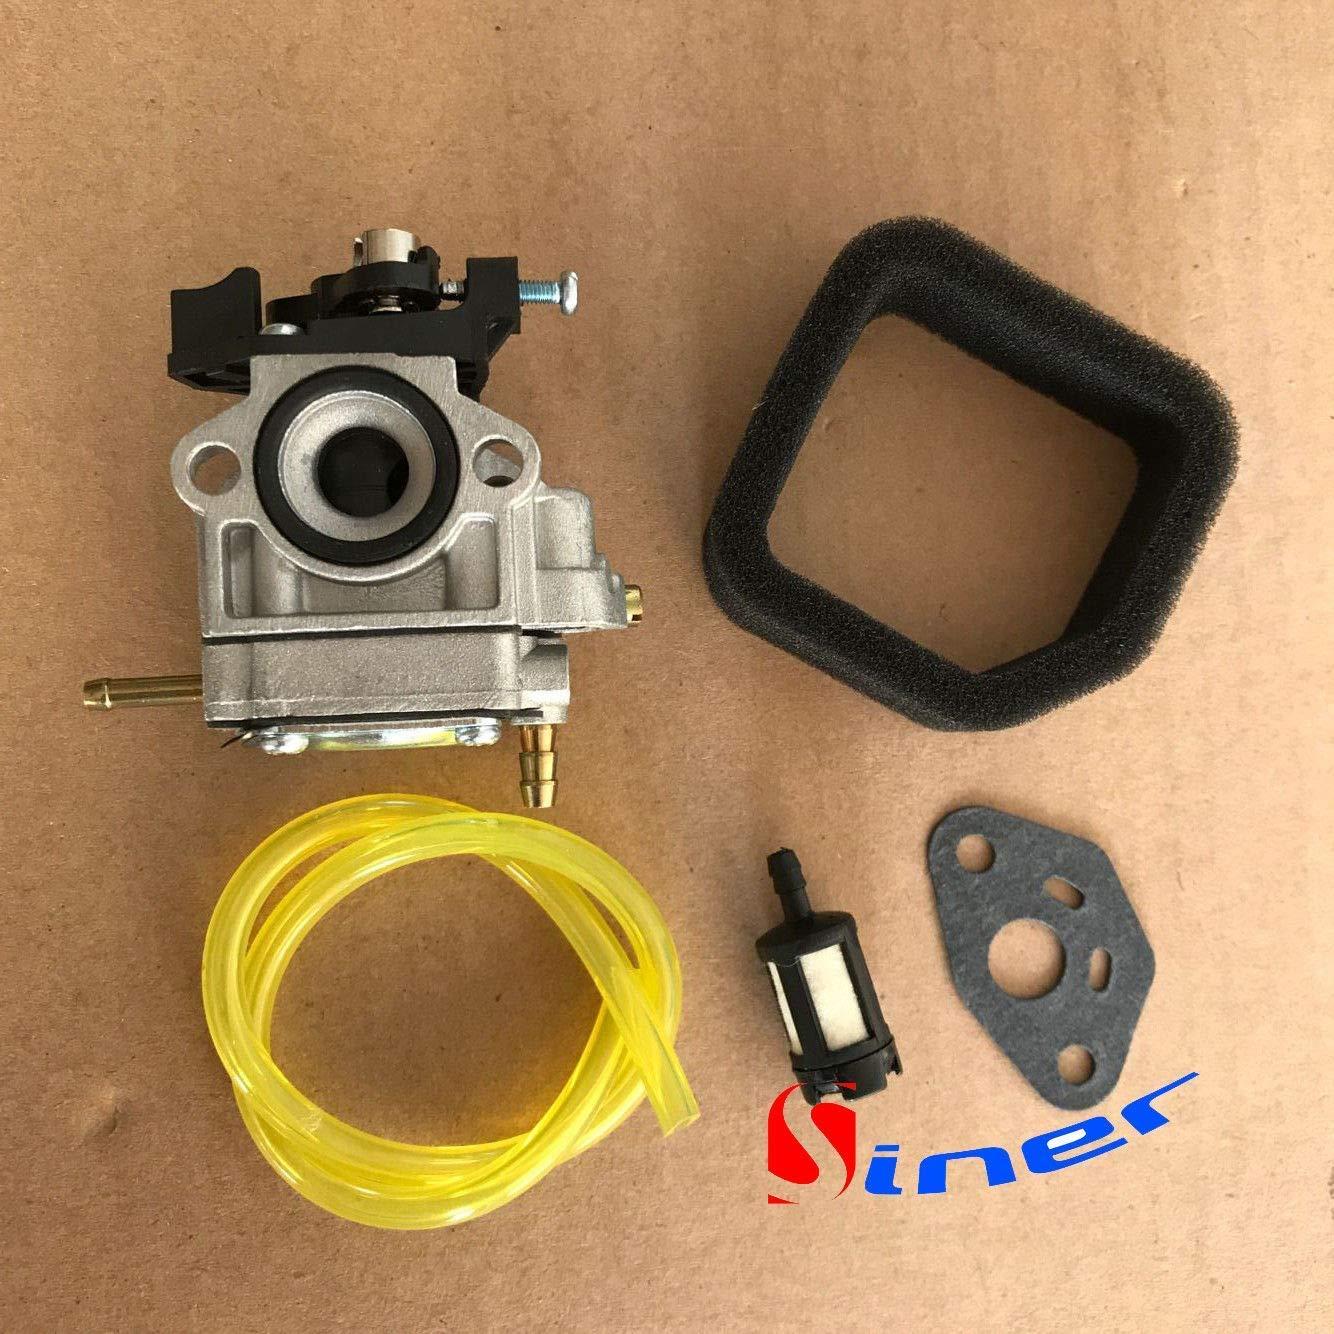 HQparts Carburetor for Toro Trimmer Model 51930 51932 51934 51930B 51932B 3074502 + 9071103